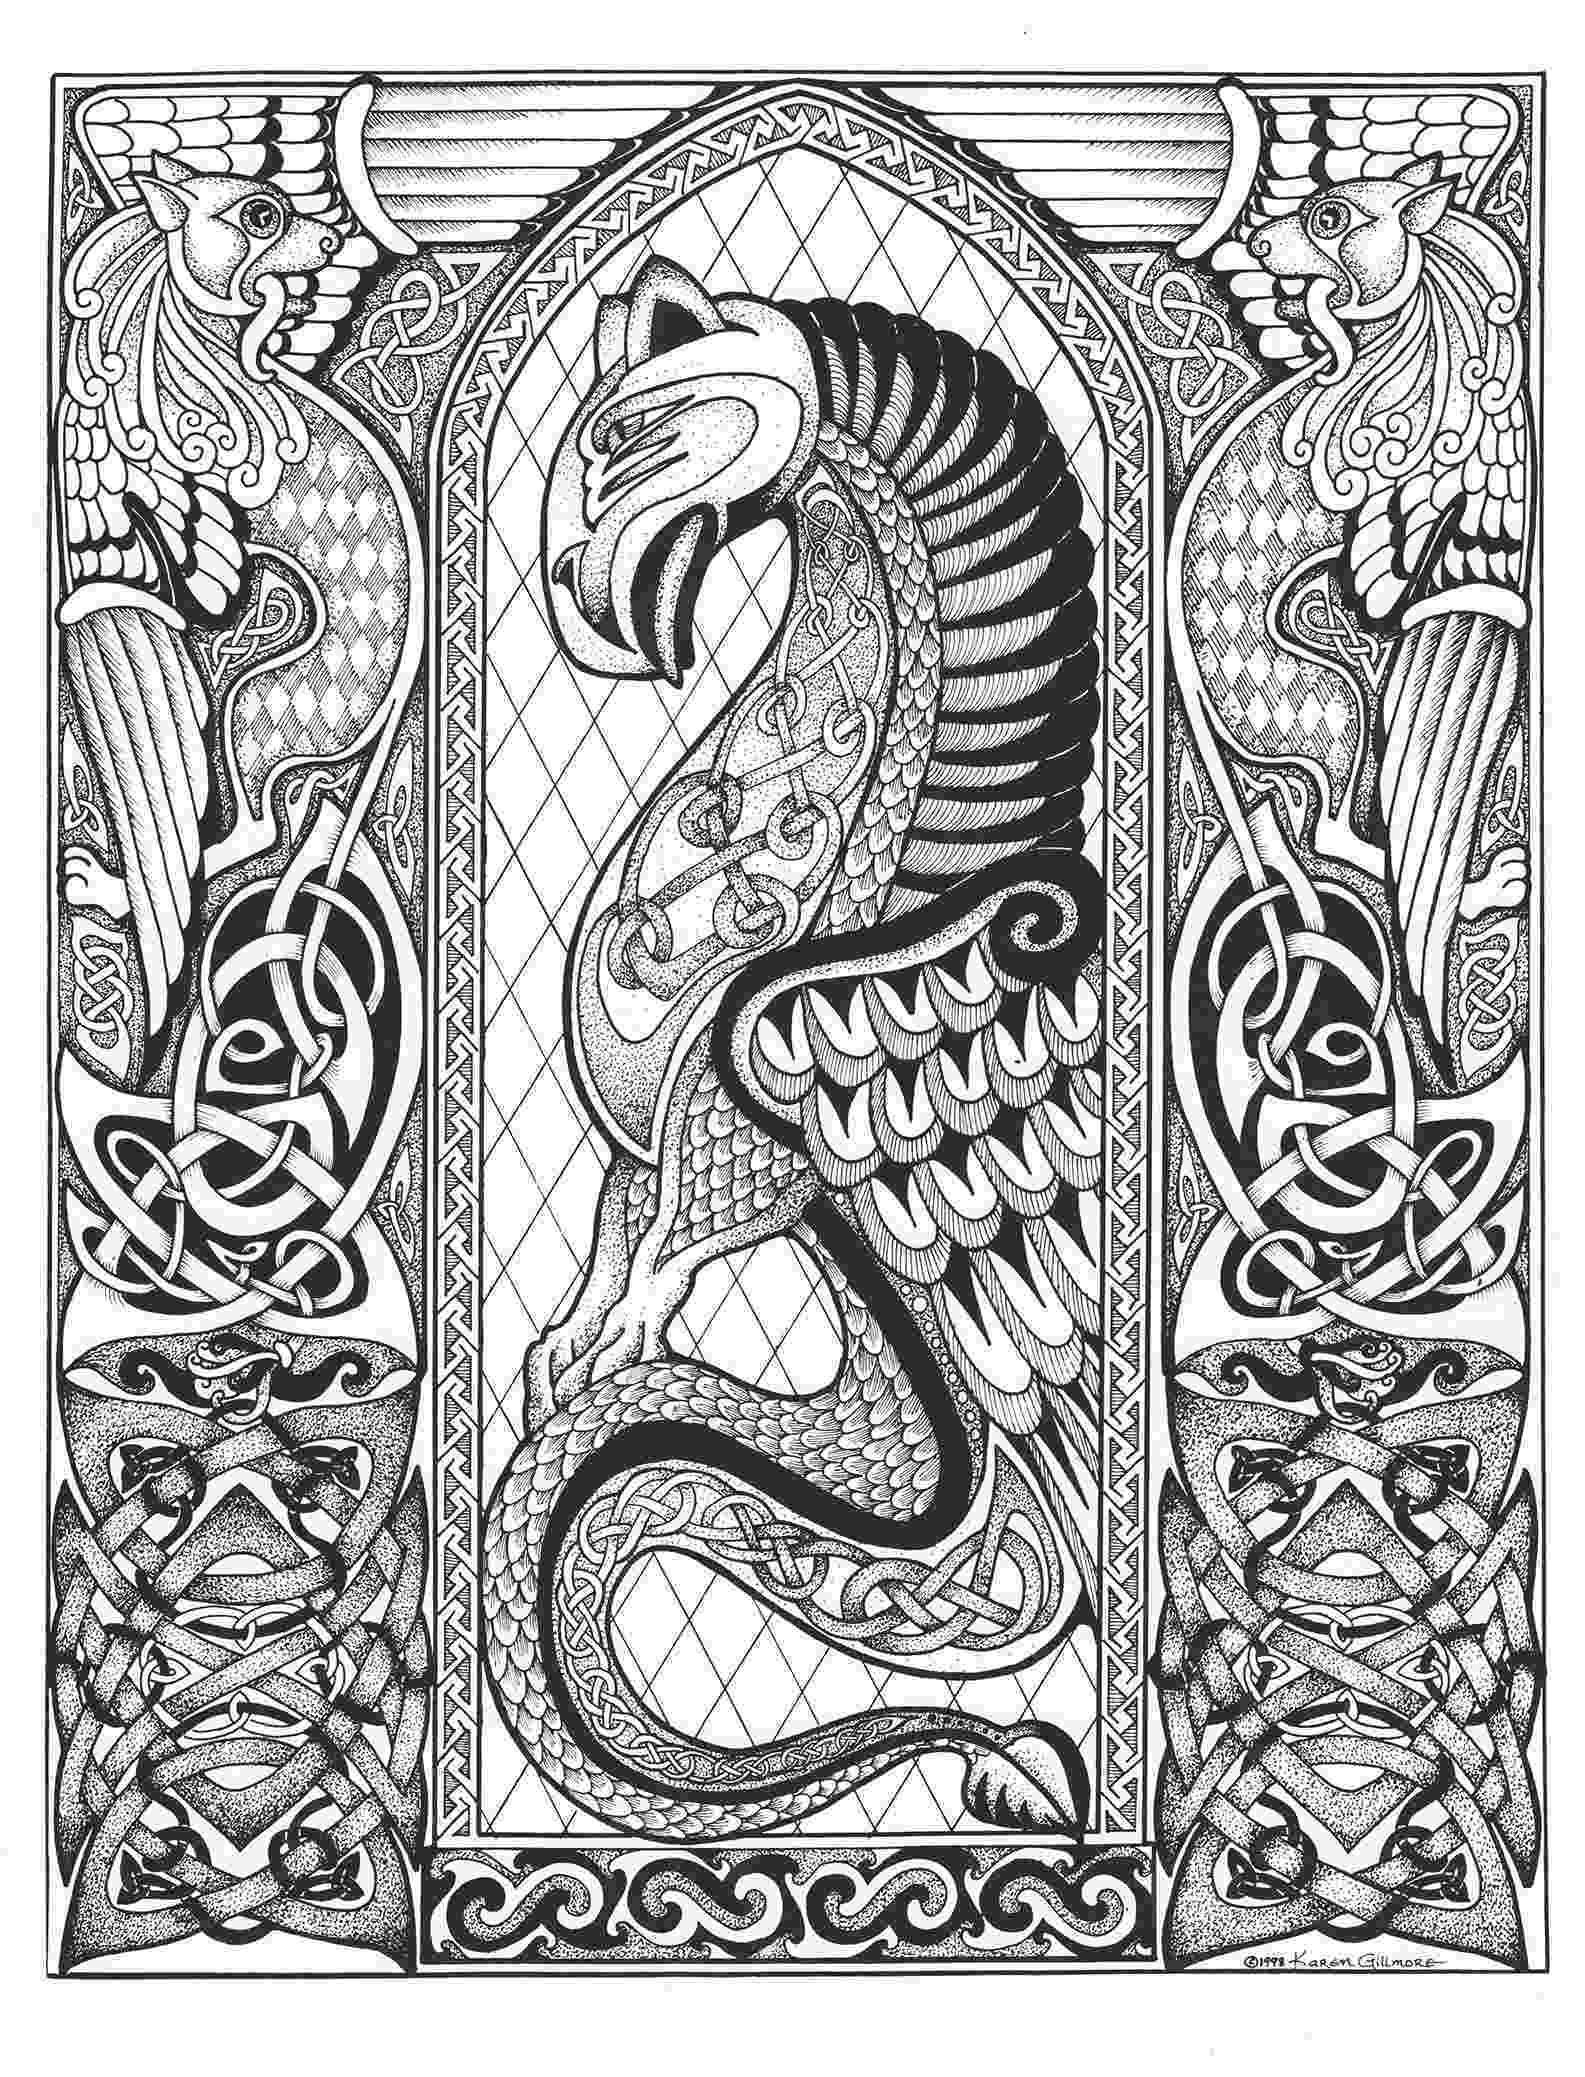 celtic art celtic knot clipart free download best celtic knot art celtic